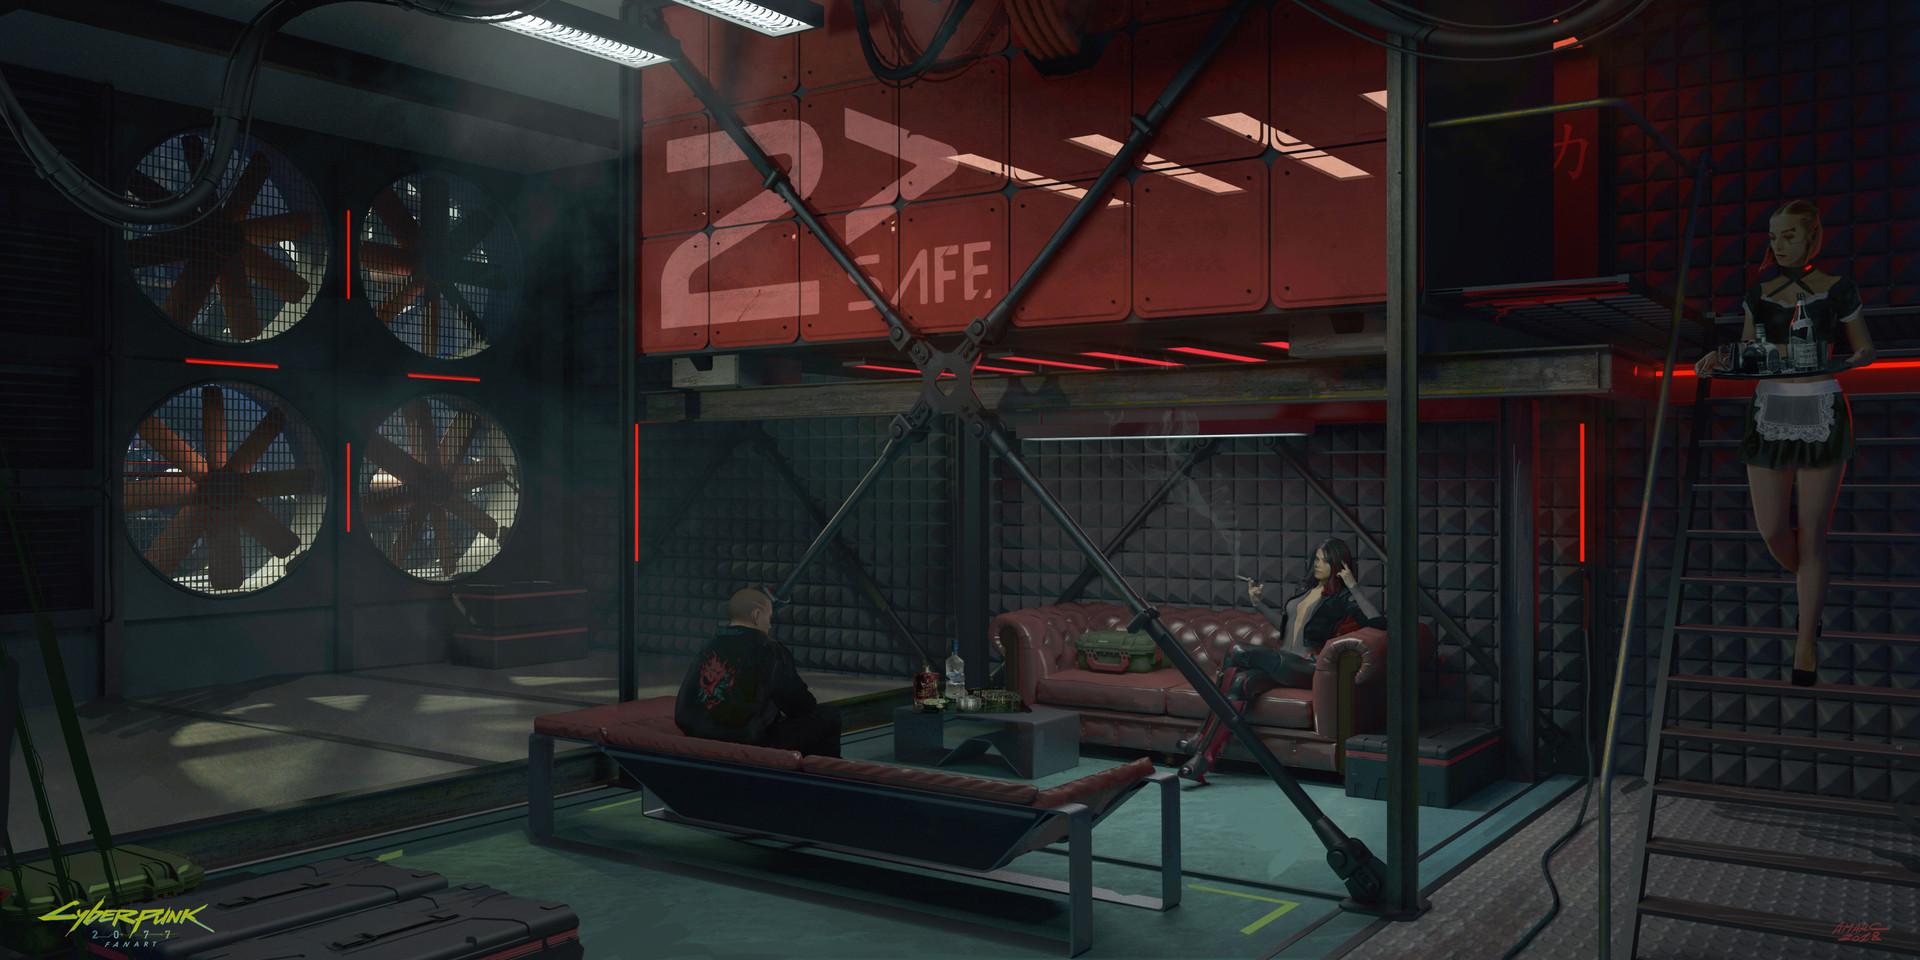 cyberpunk-hideout - Cyberpunk 2077